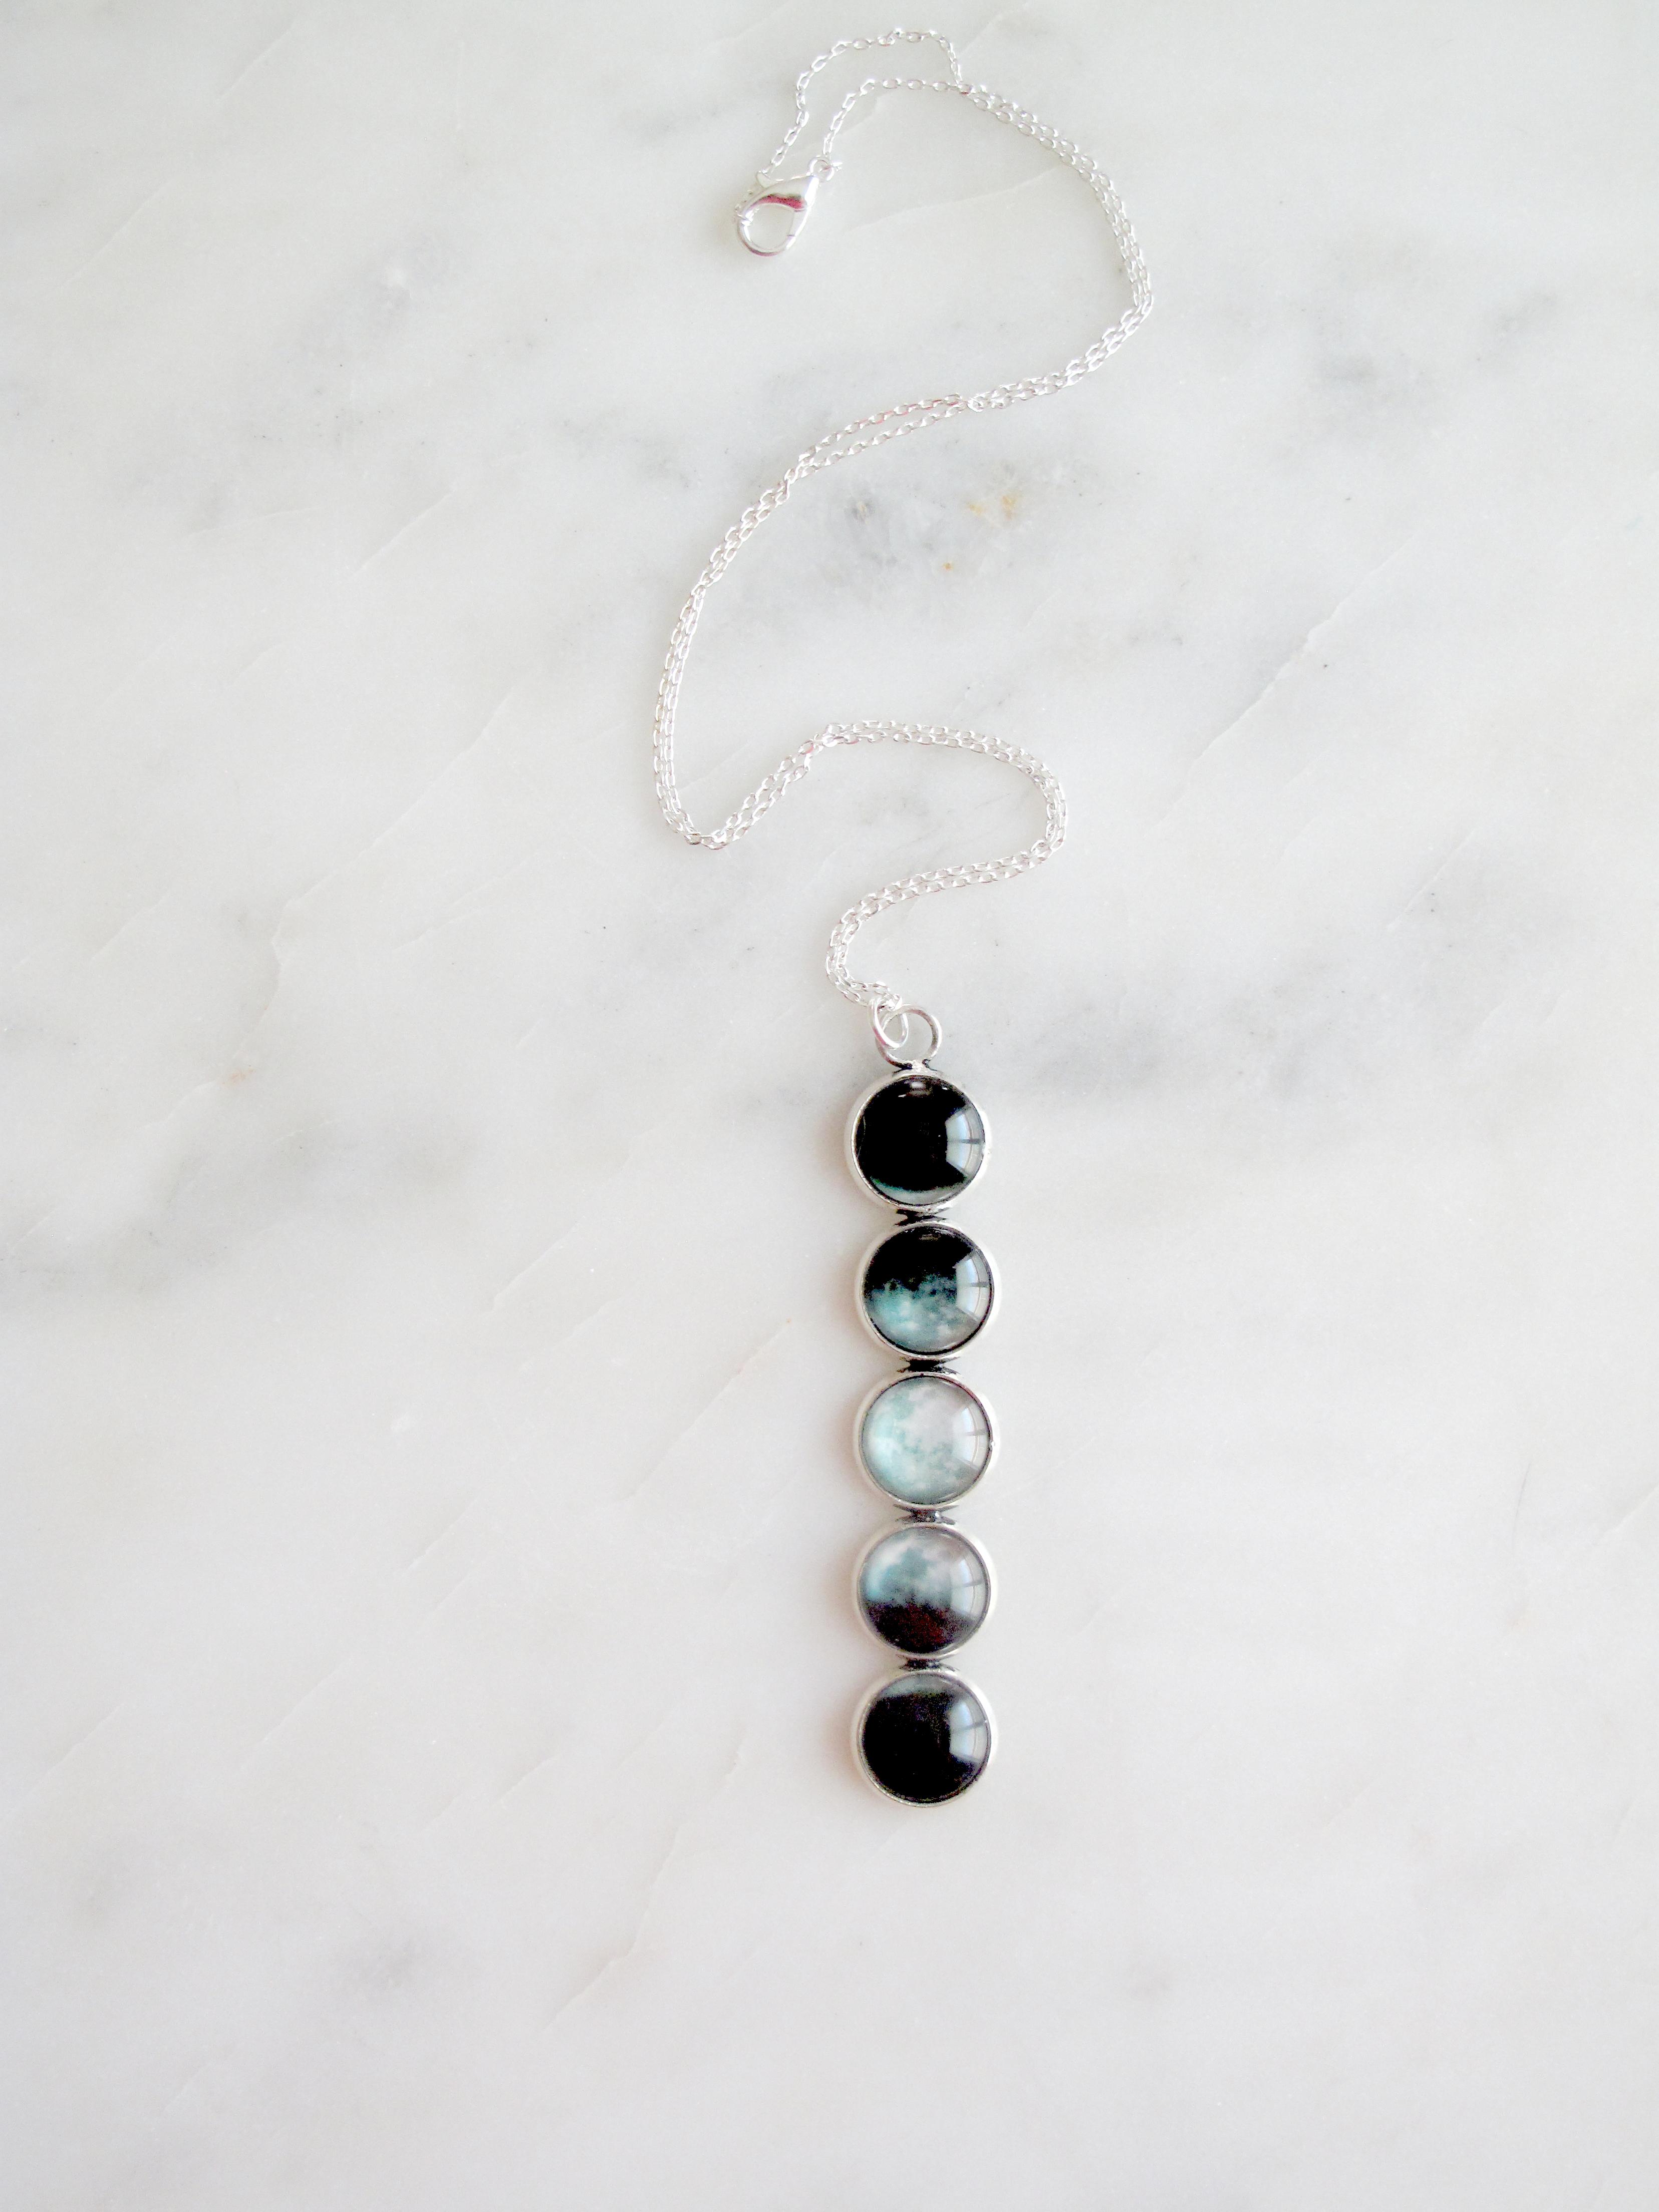 https://www.aprilalayne.com/shop/shopping/yugen-moon-phase-pendant-necklace/